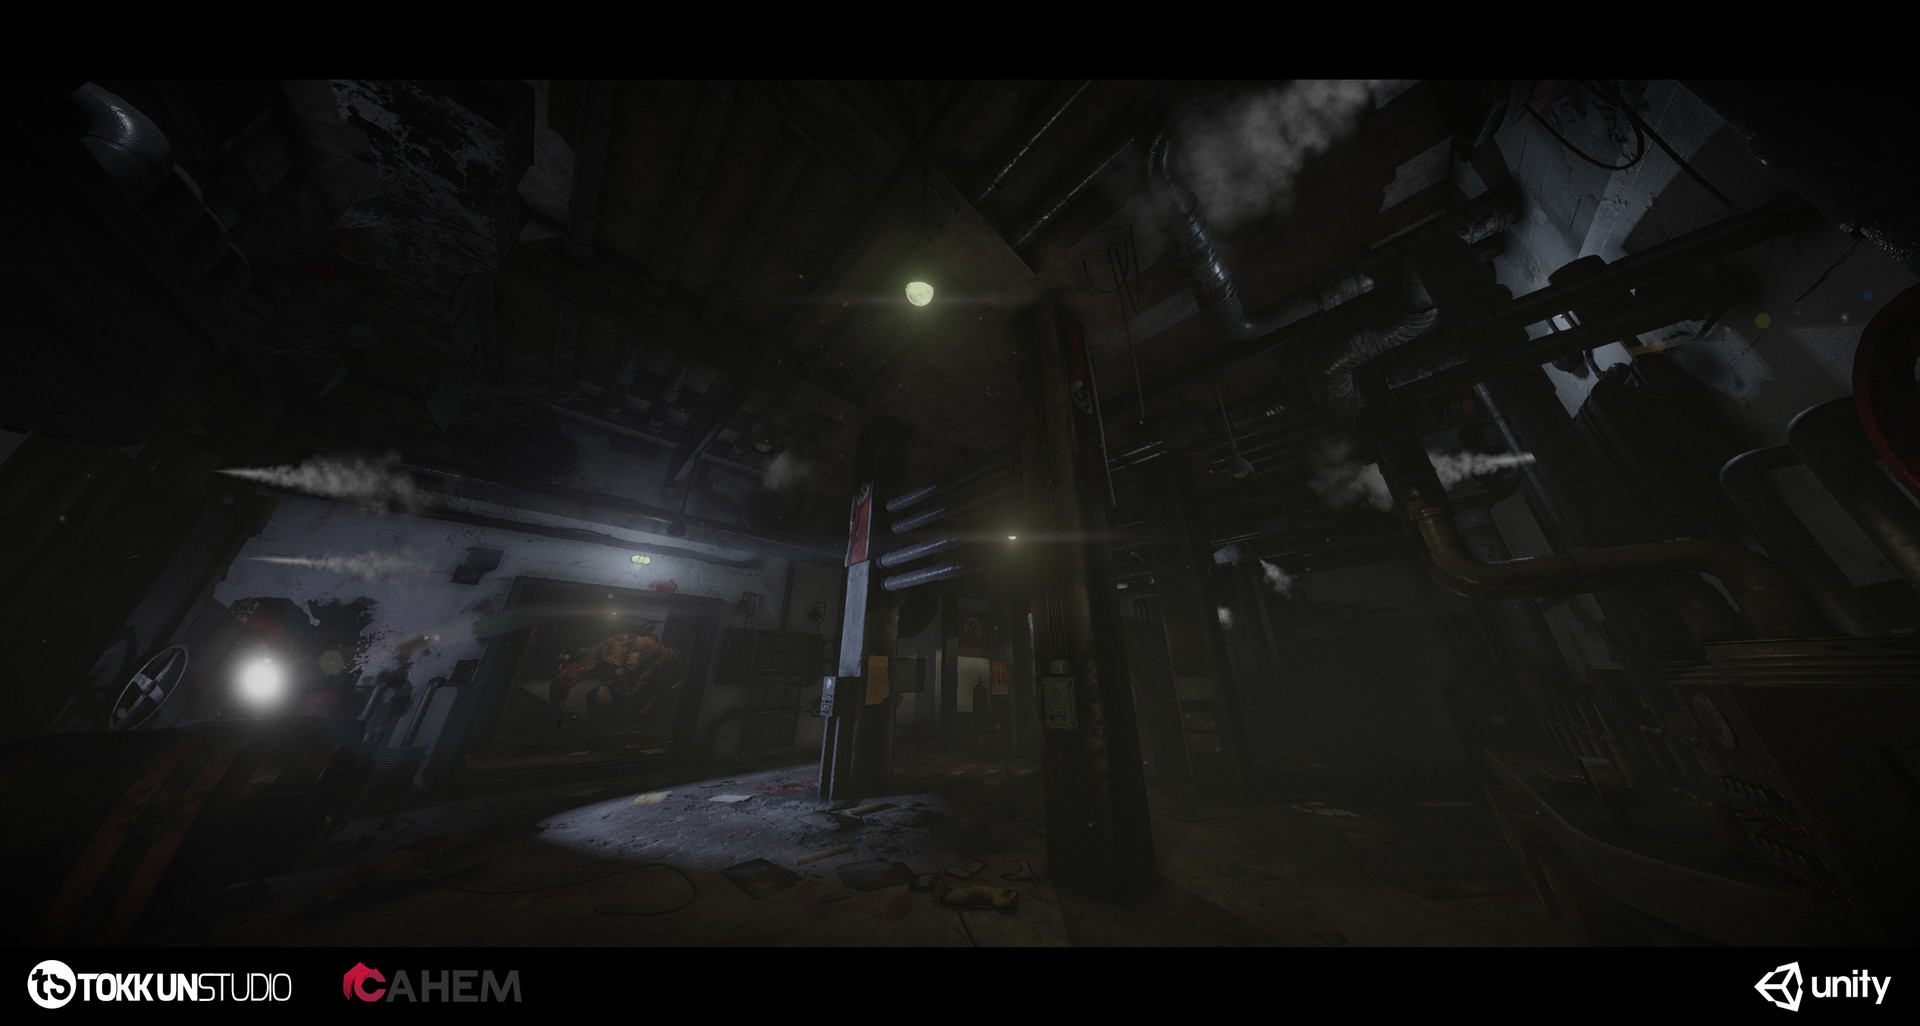 Tokkun studio bunker shot 18